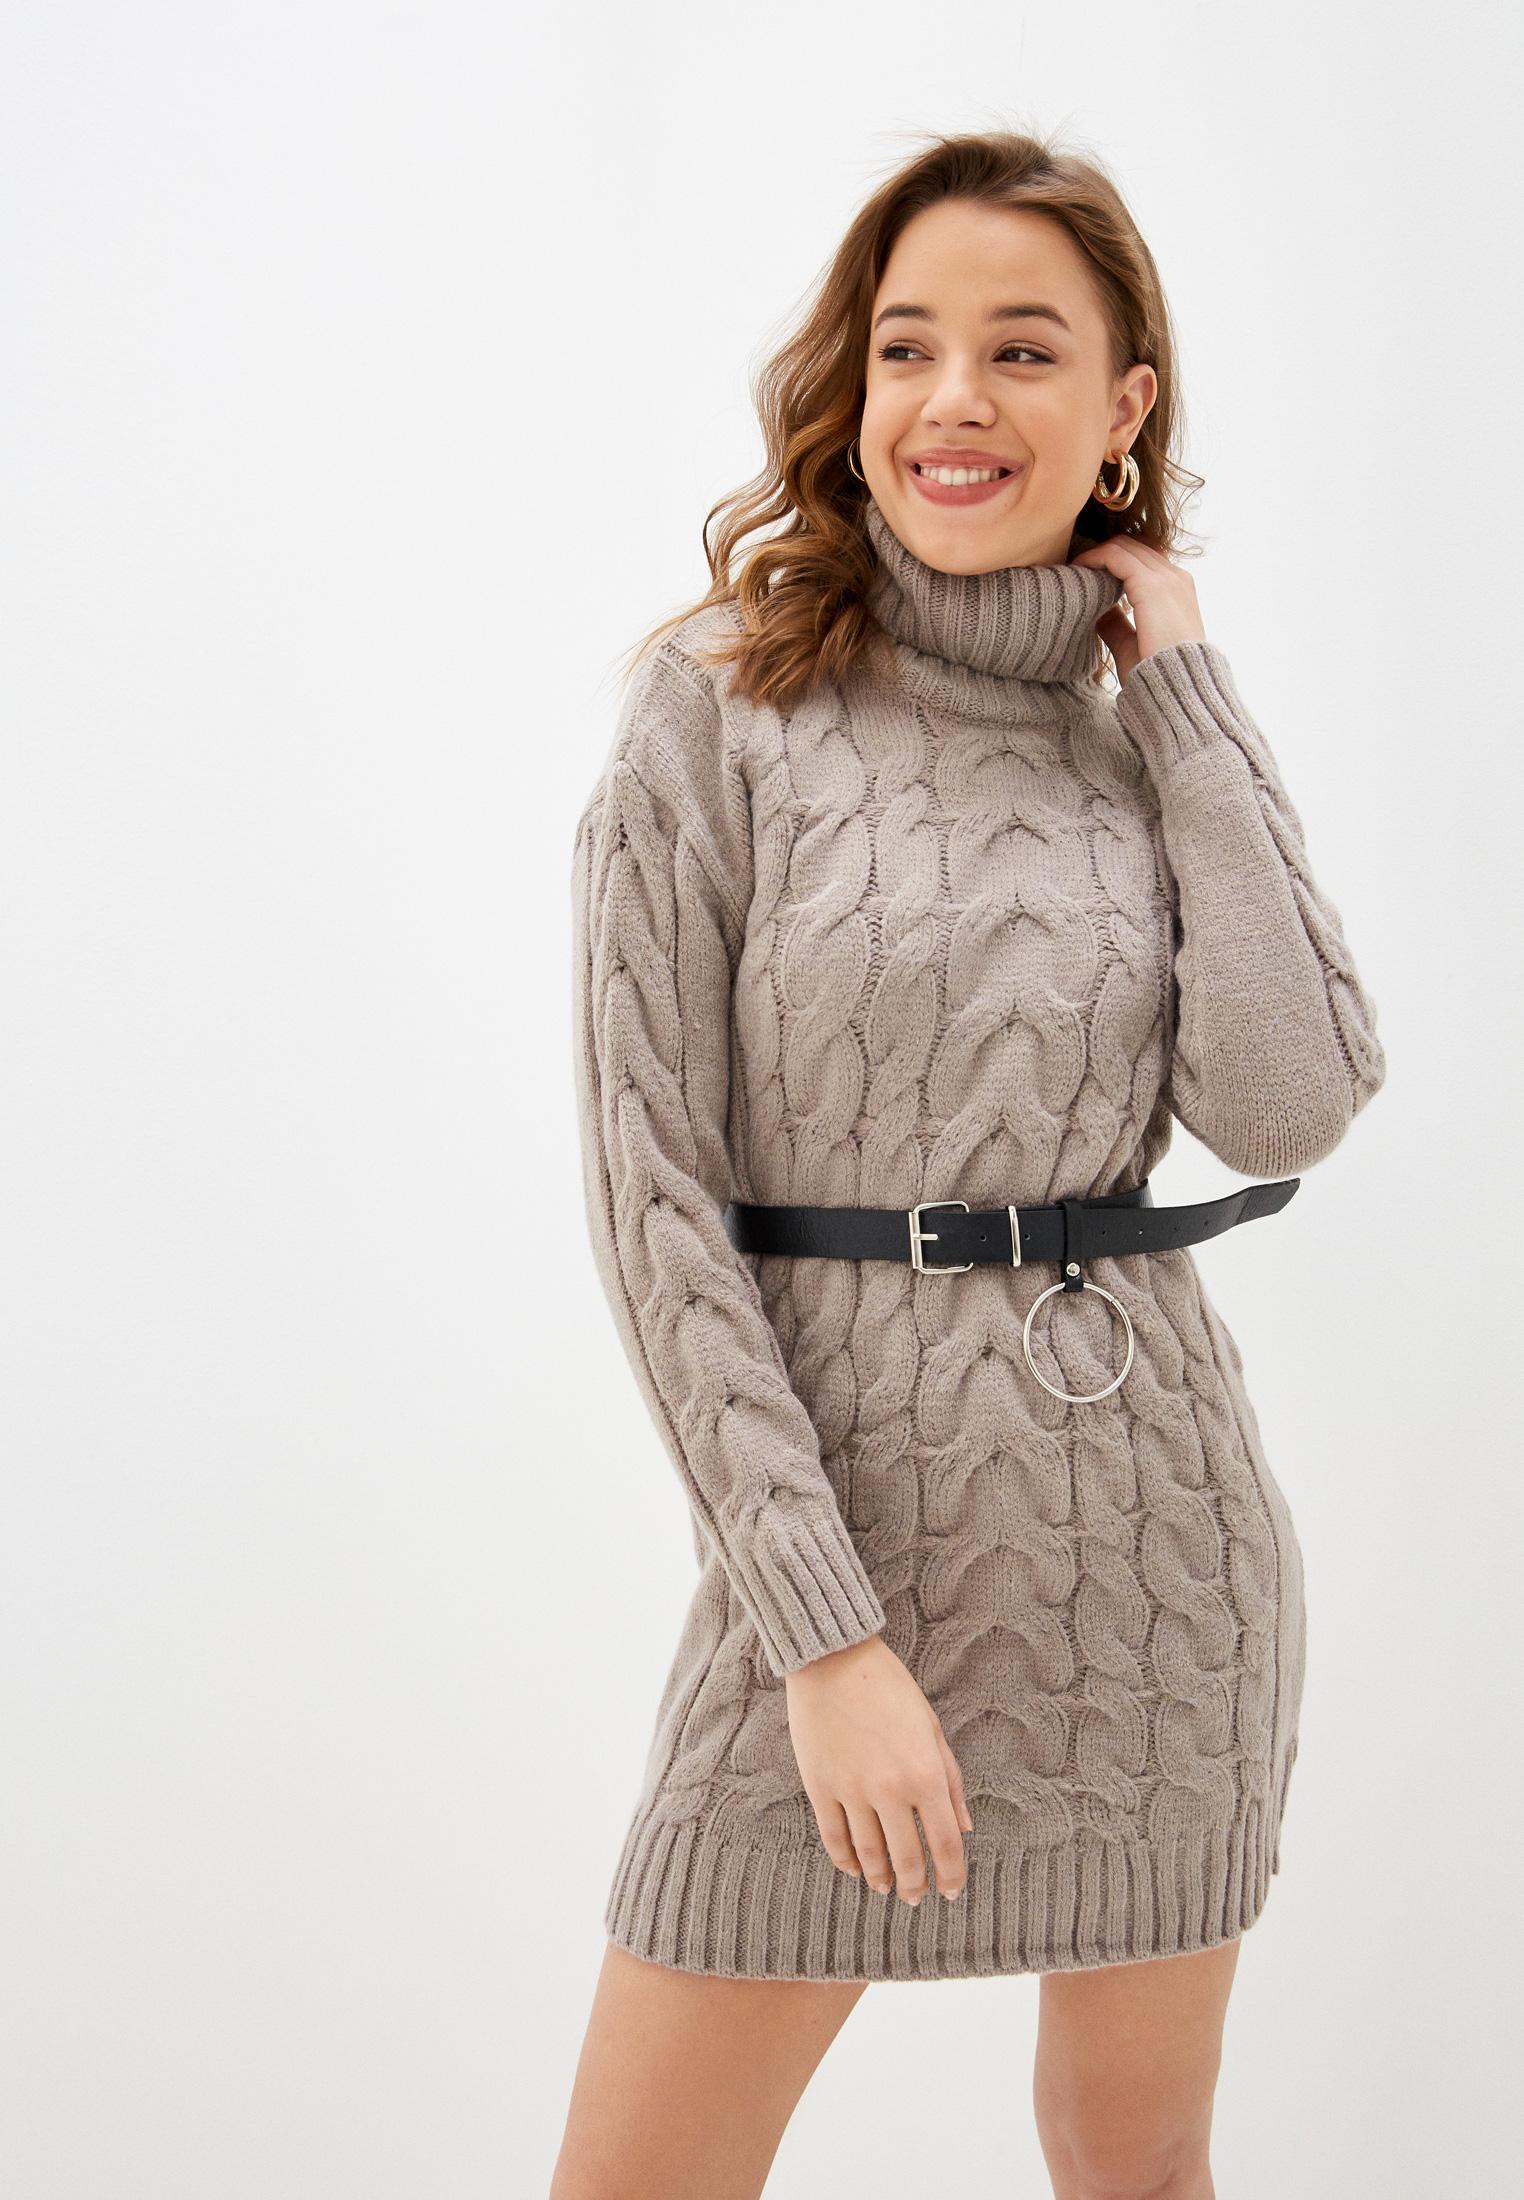 Вязаное платье Vickwool WV271-4